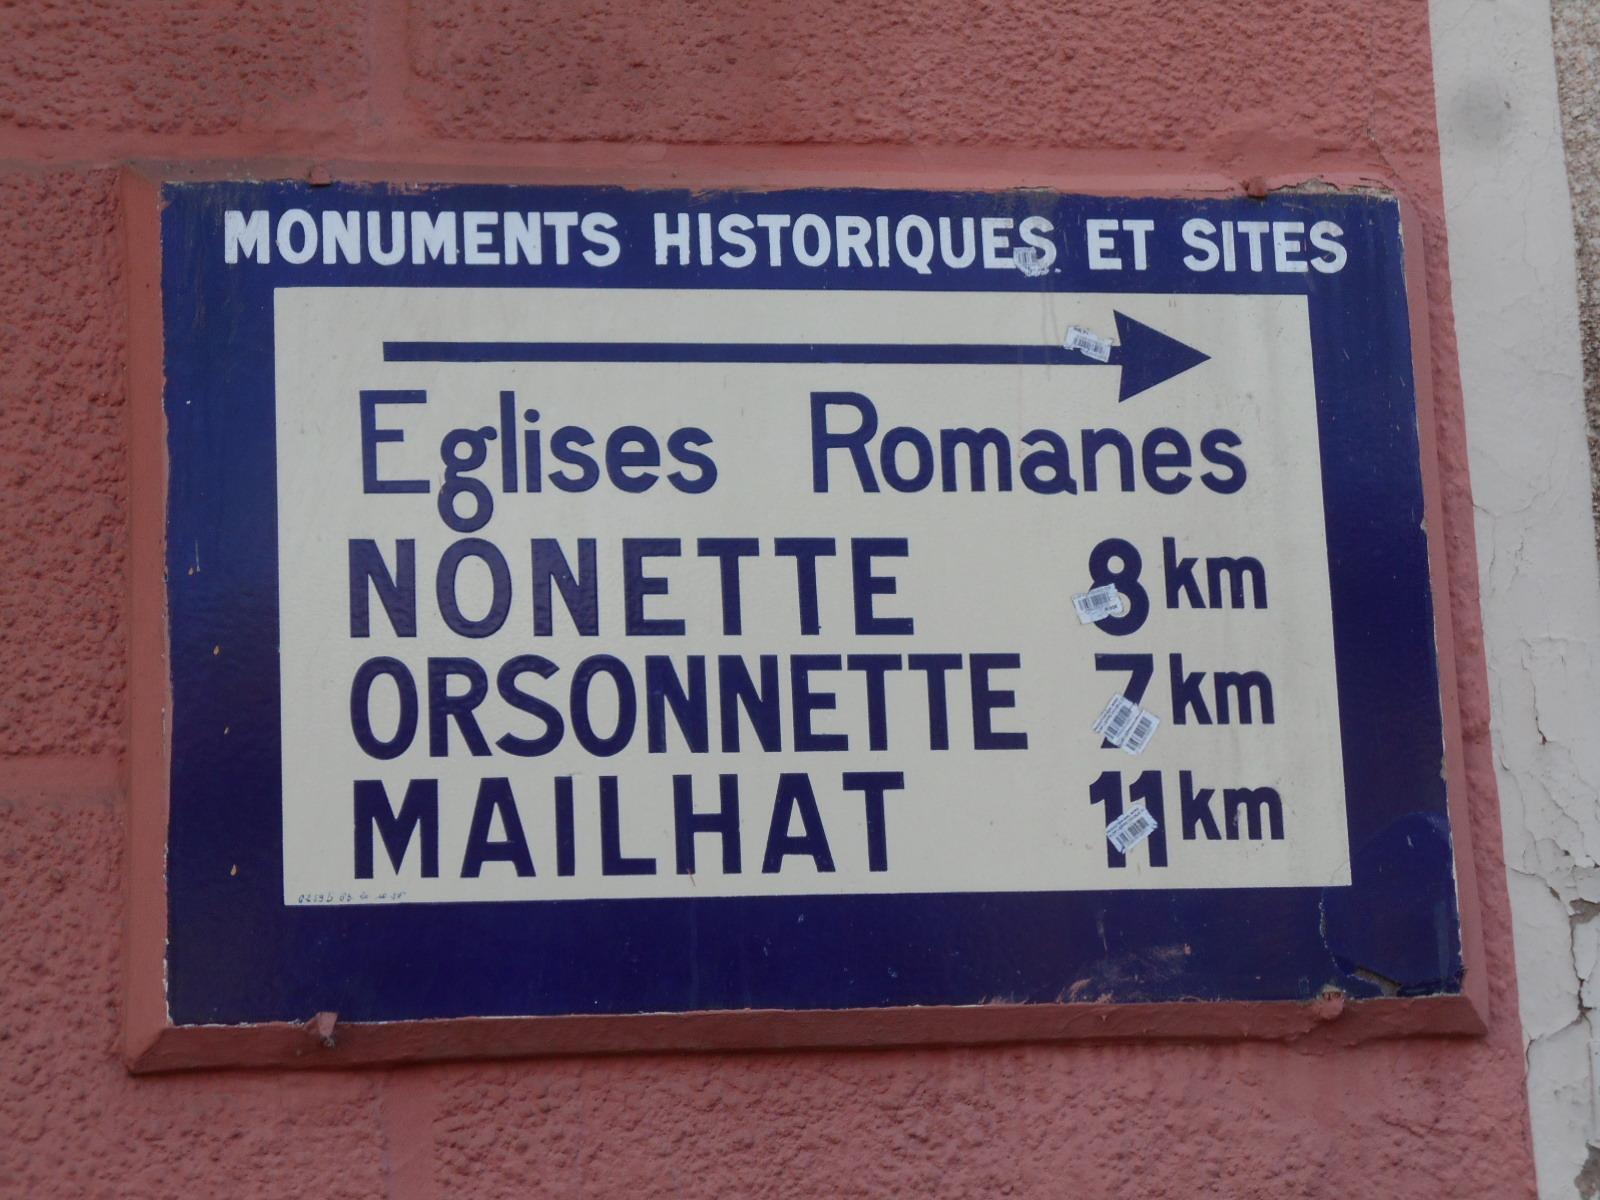 63340 Saint Germain Lembron